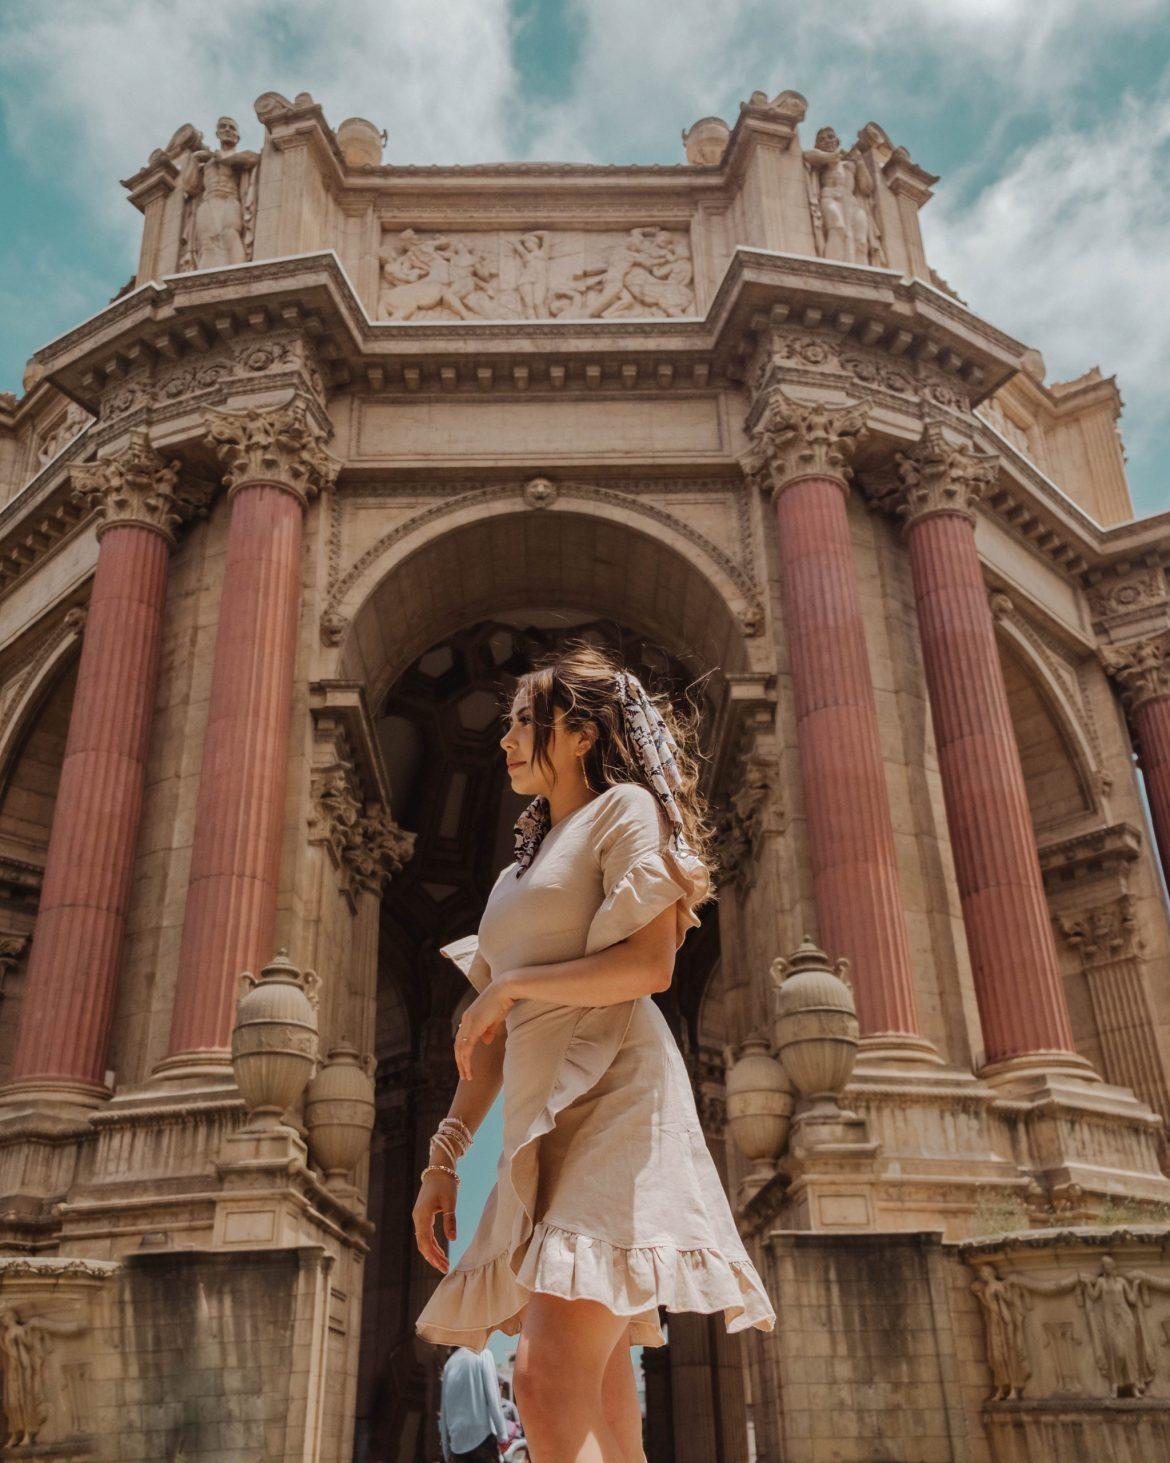 The Perfect 3-Day San Francisco Itinerary | Palace of Fine Arts, San Francisco outfit, San Francisco photo idea, California travel